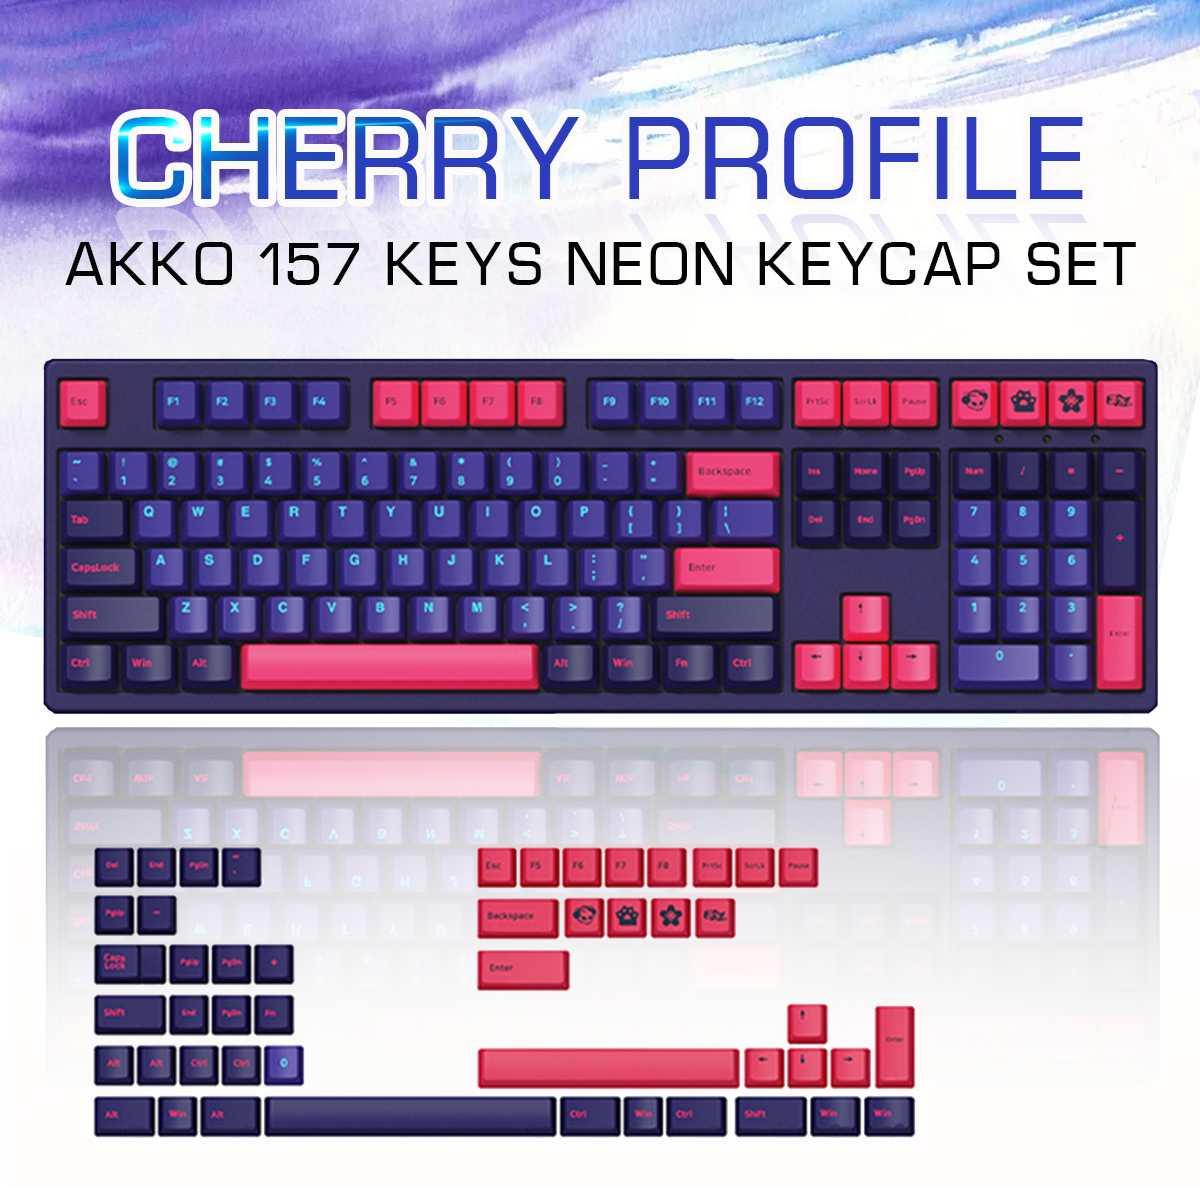 AKKO 157 مفاتيح نيون Keycap مجموعة الكرز الشخصي PBT لونين صب المفاتيح للوحة المفاتيح الميكانيكية تغيير مفتاح الفوز لمفتاح التطبيق